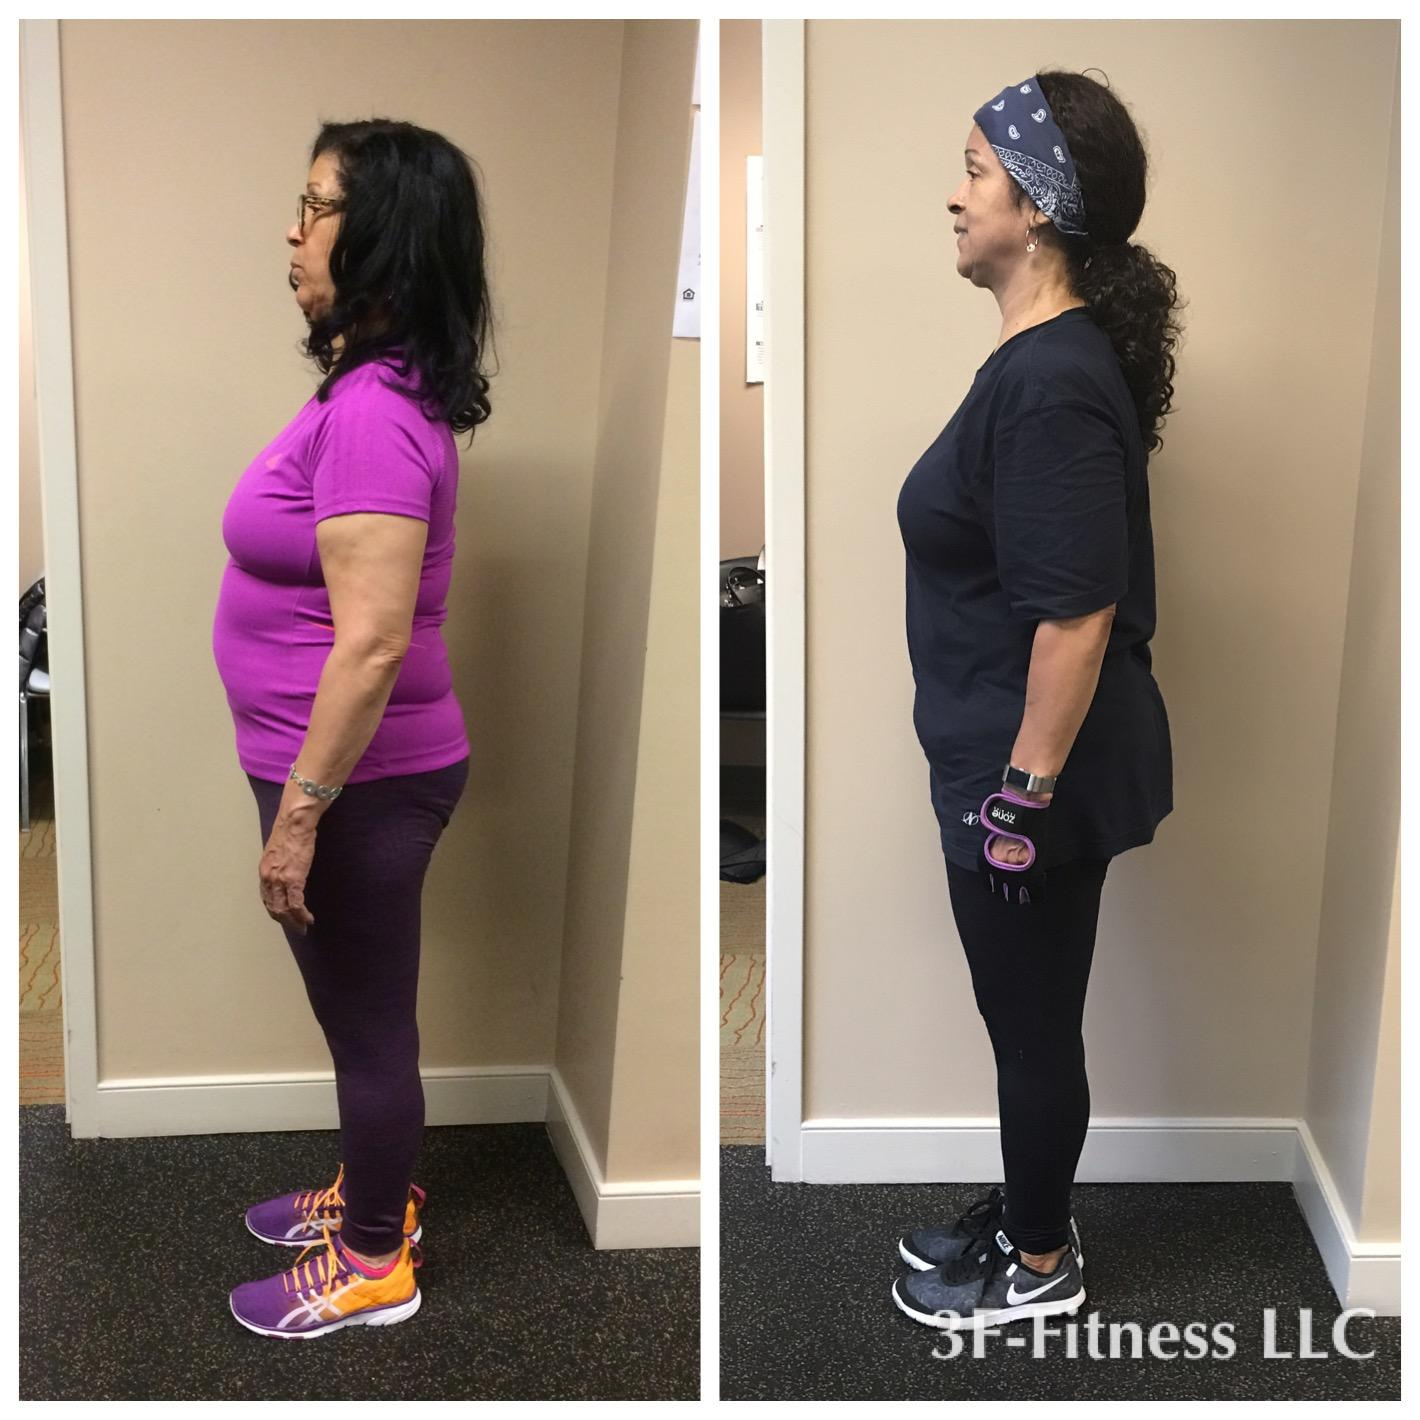 3F-Fitness LLC image 8